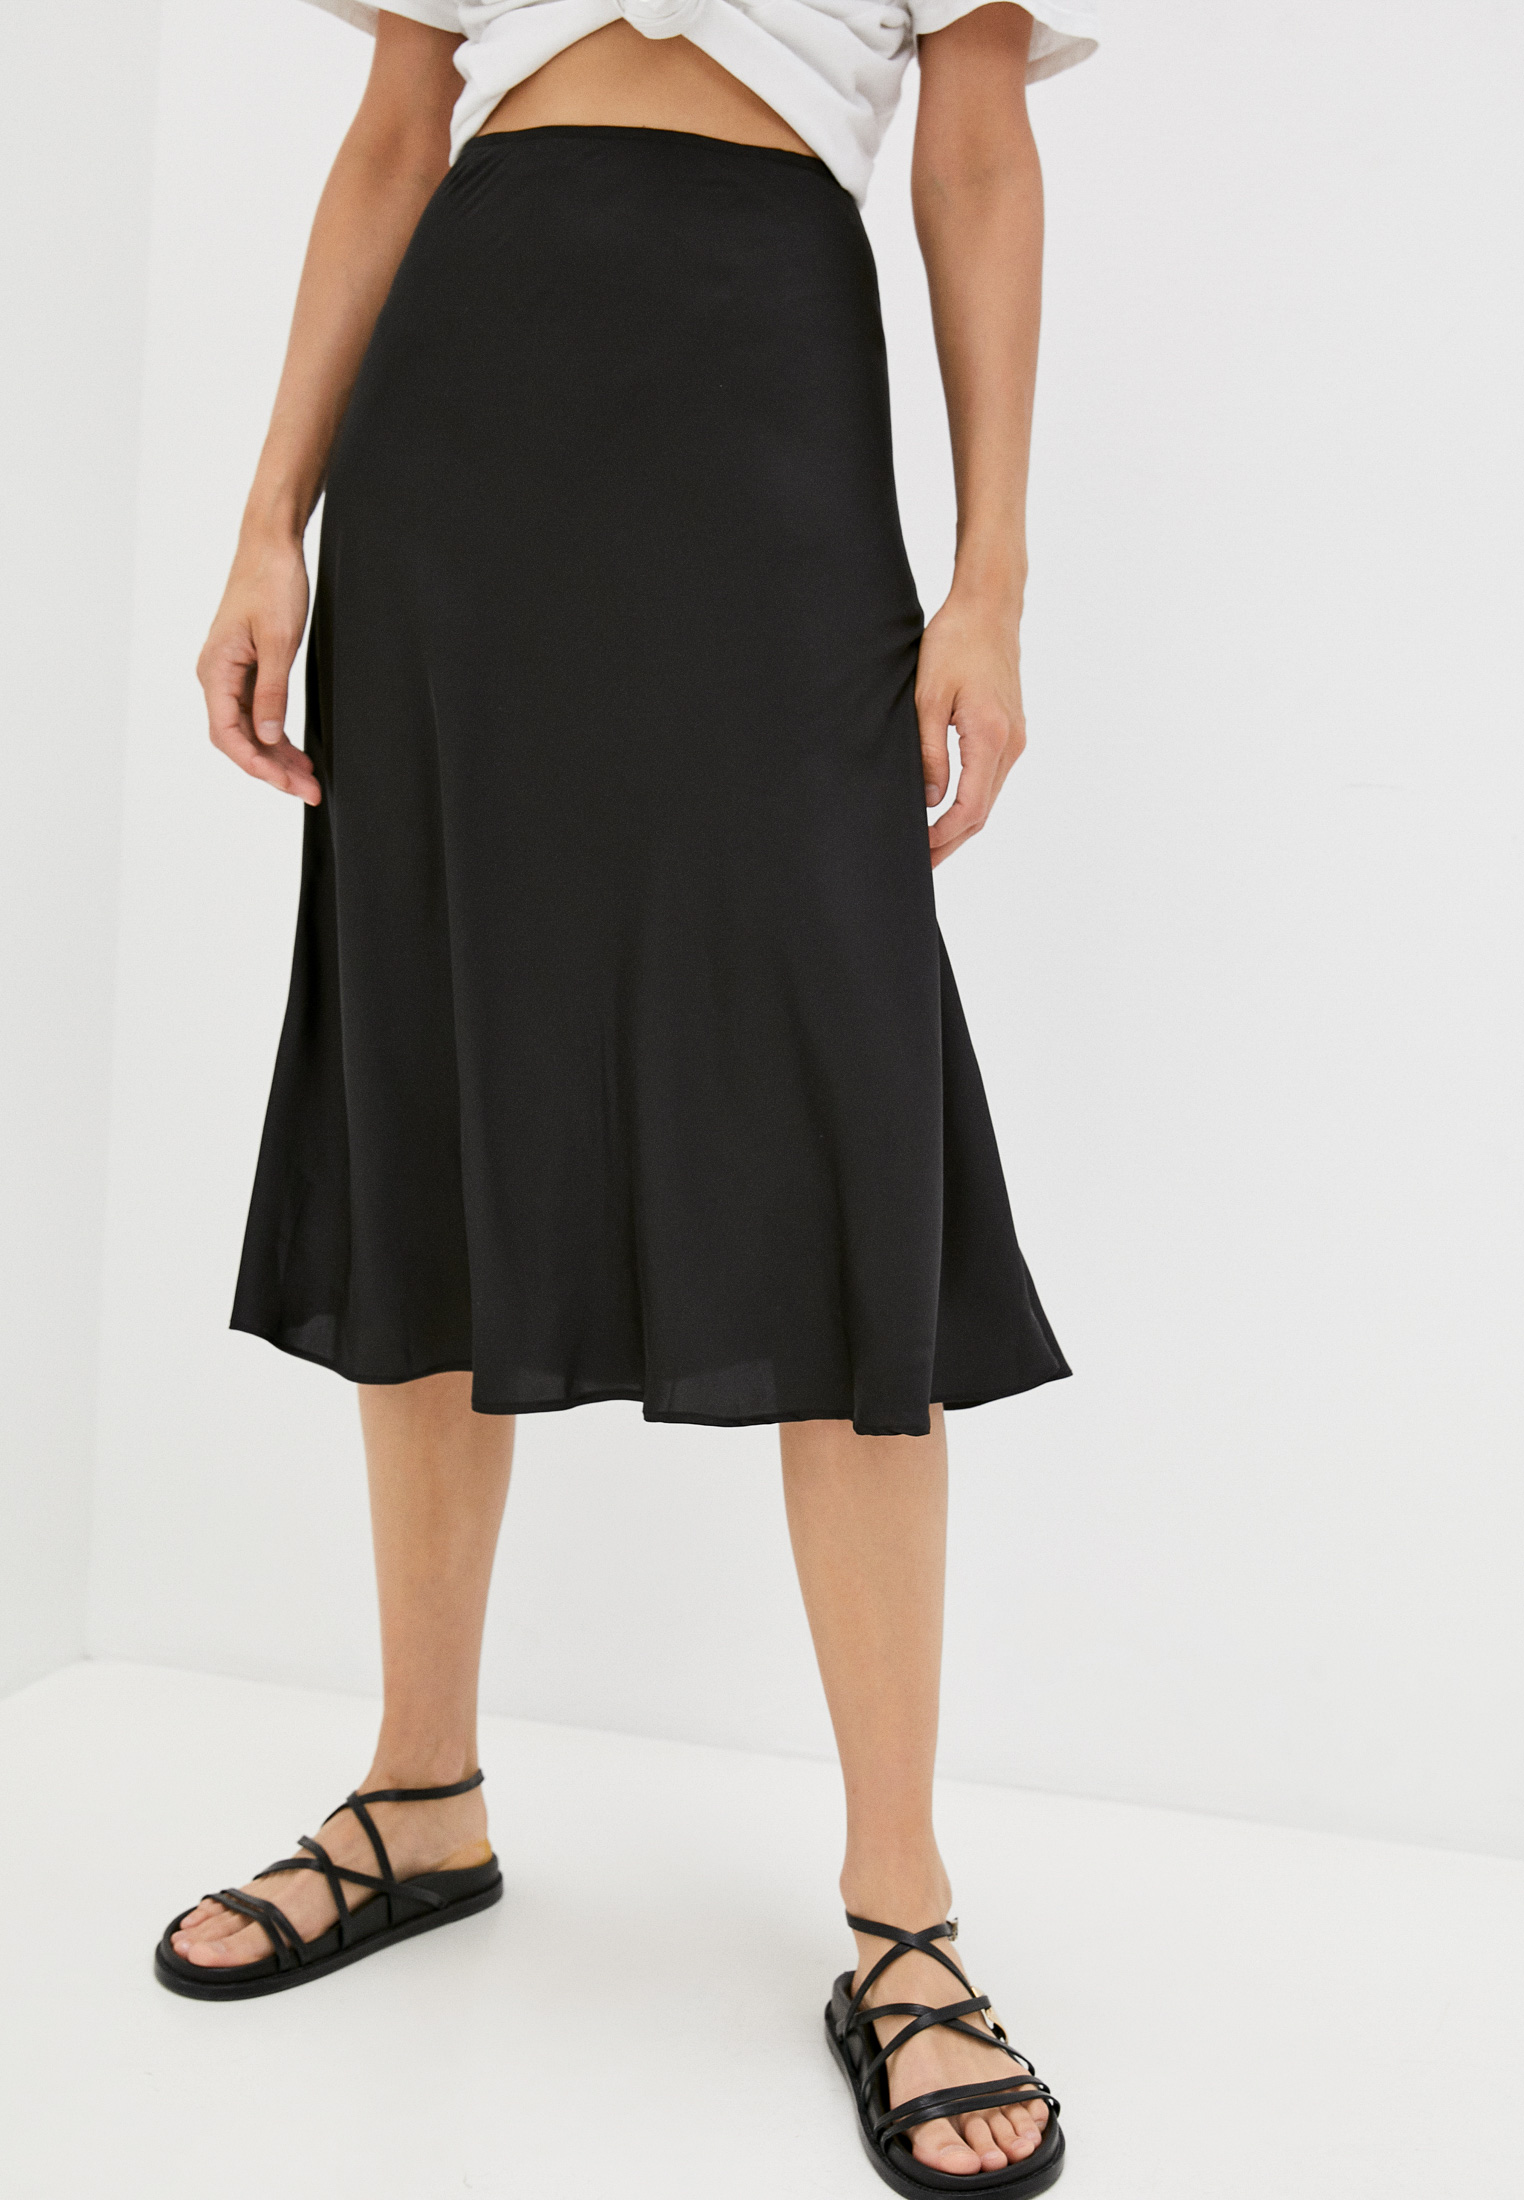 Широкая юбка Francesca Peretti Юбка Francesca Peretti